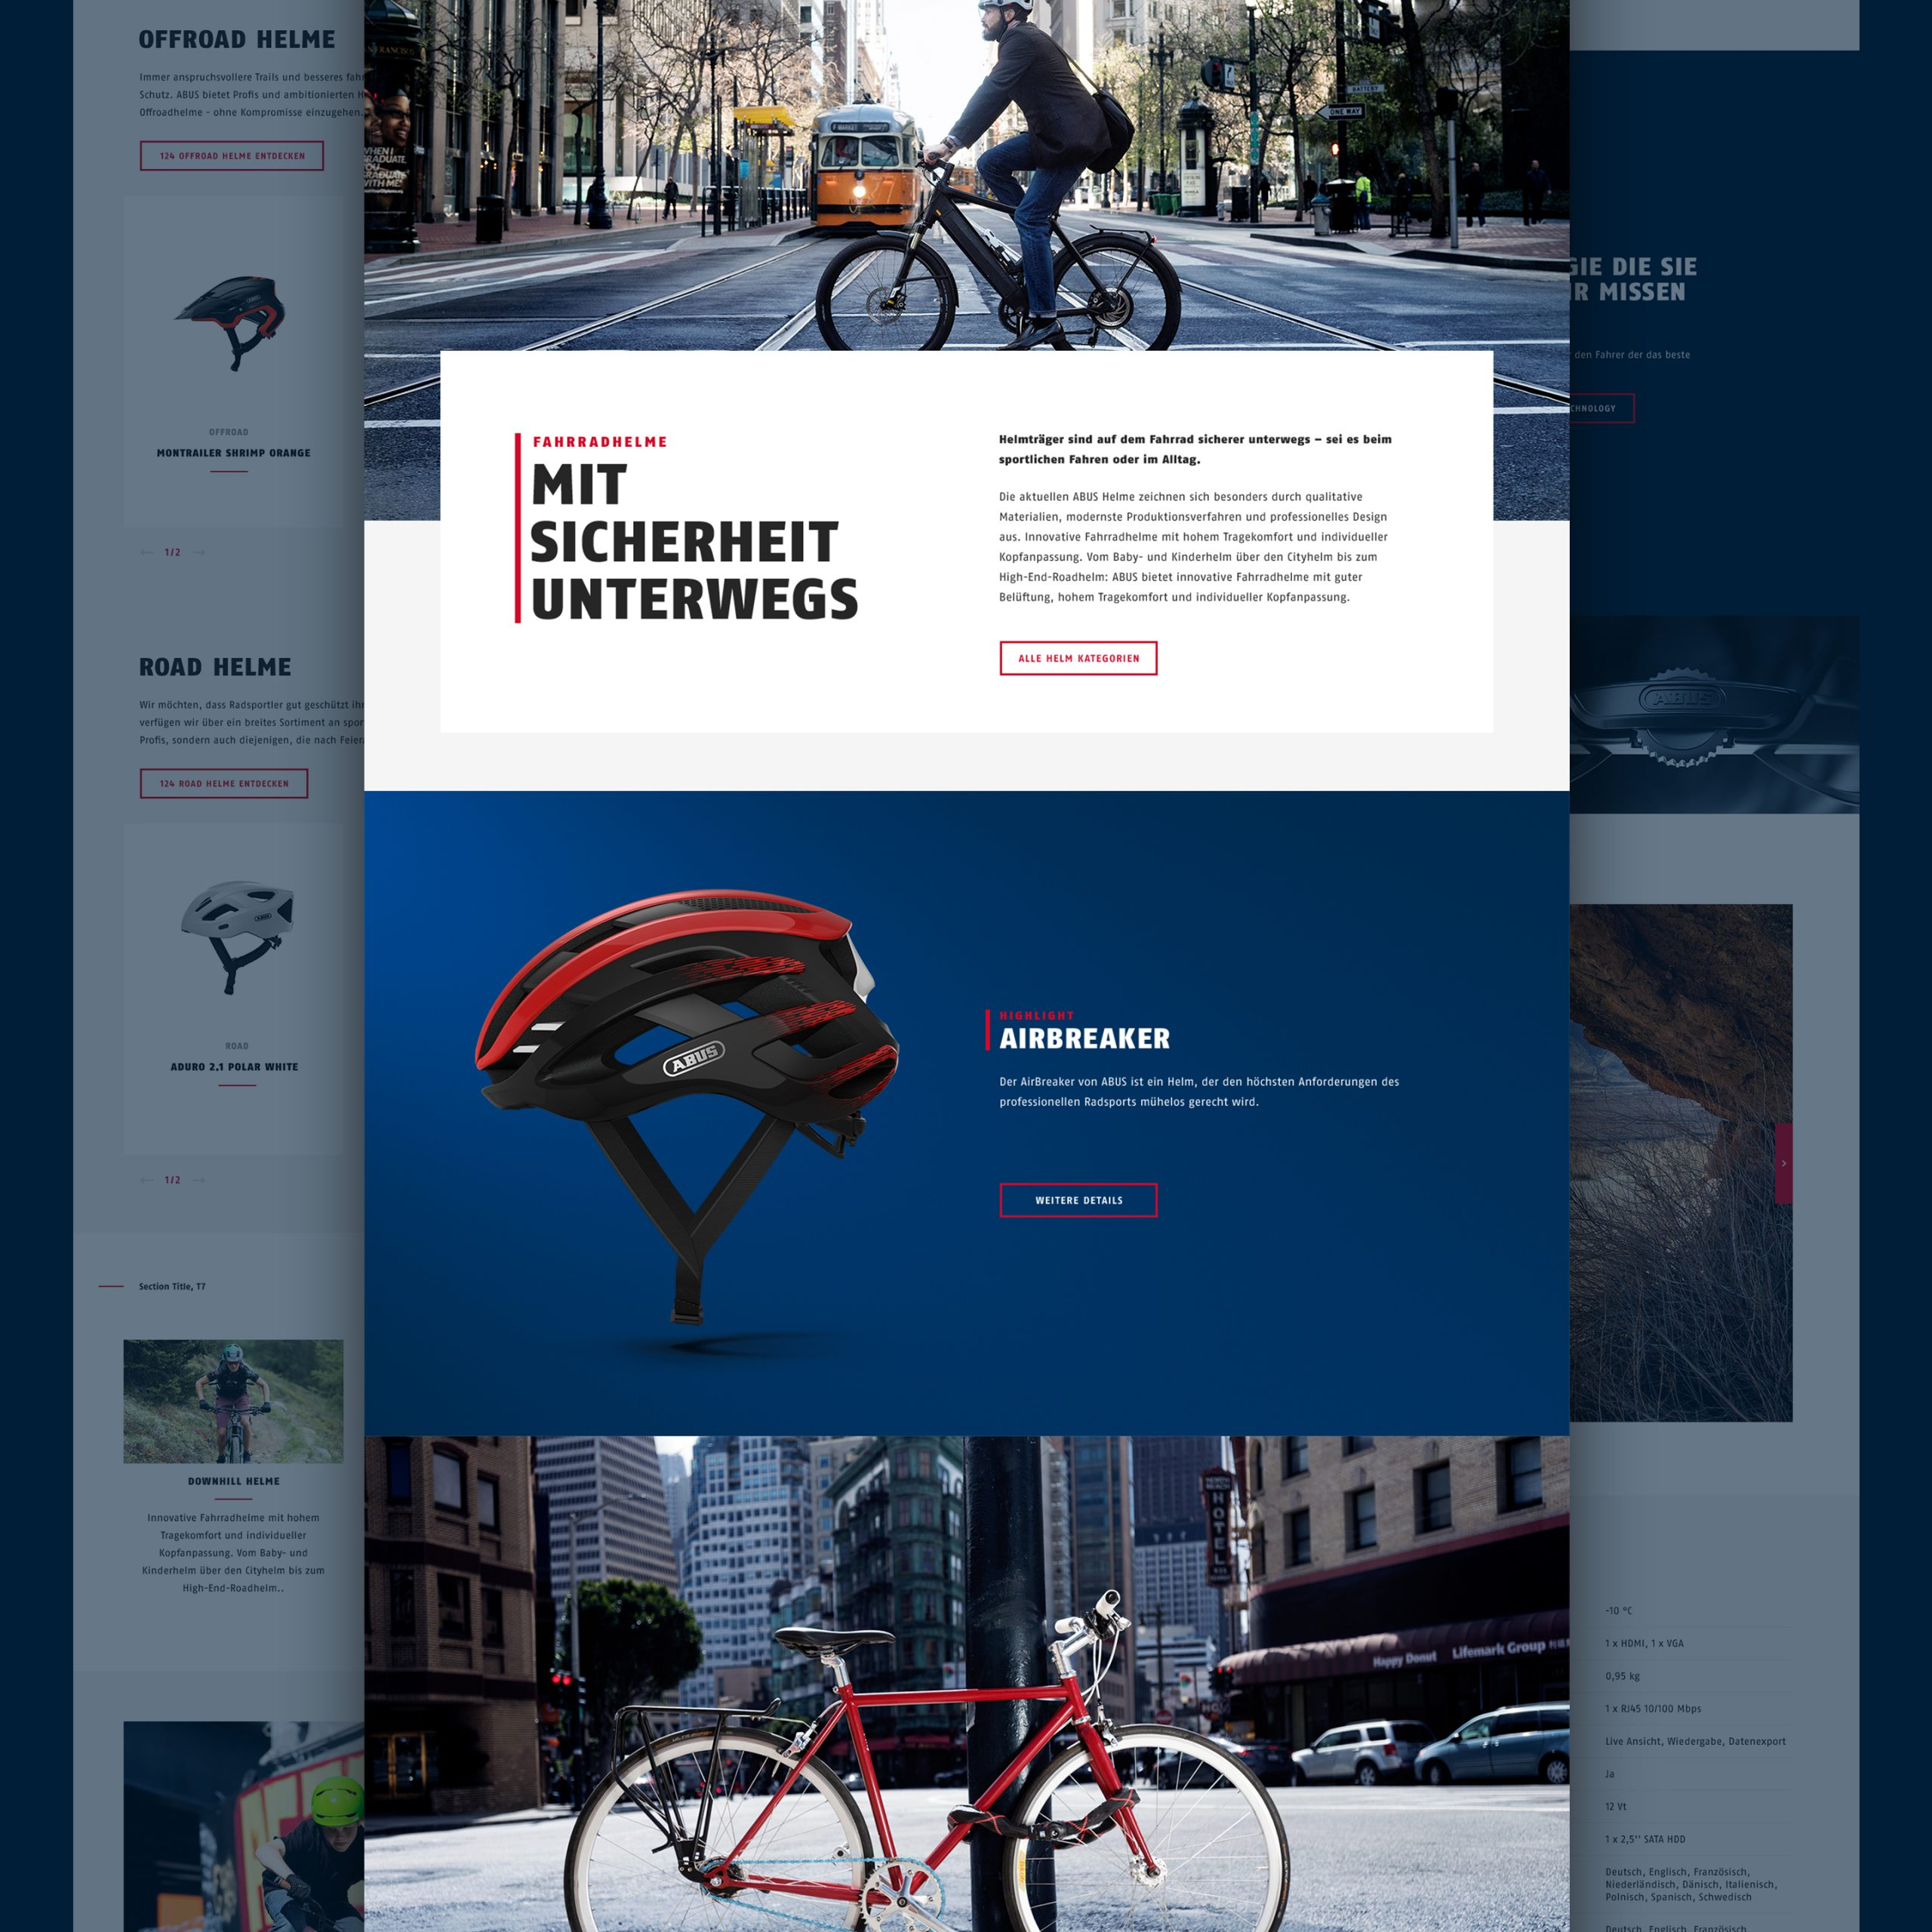 pascher-heinz-abus-website-digital-design-02